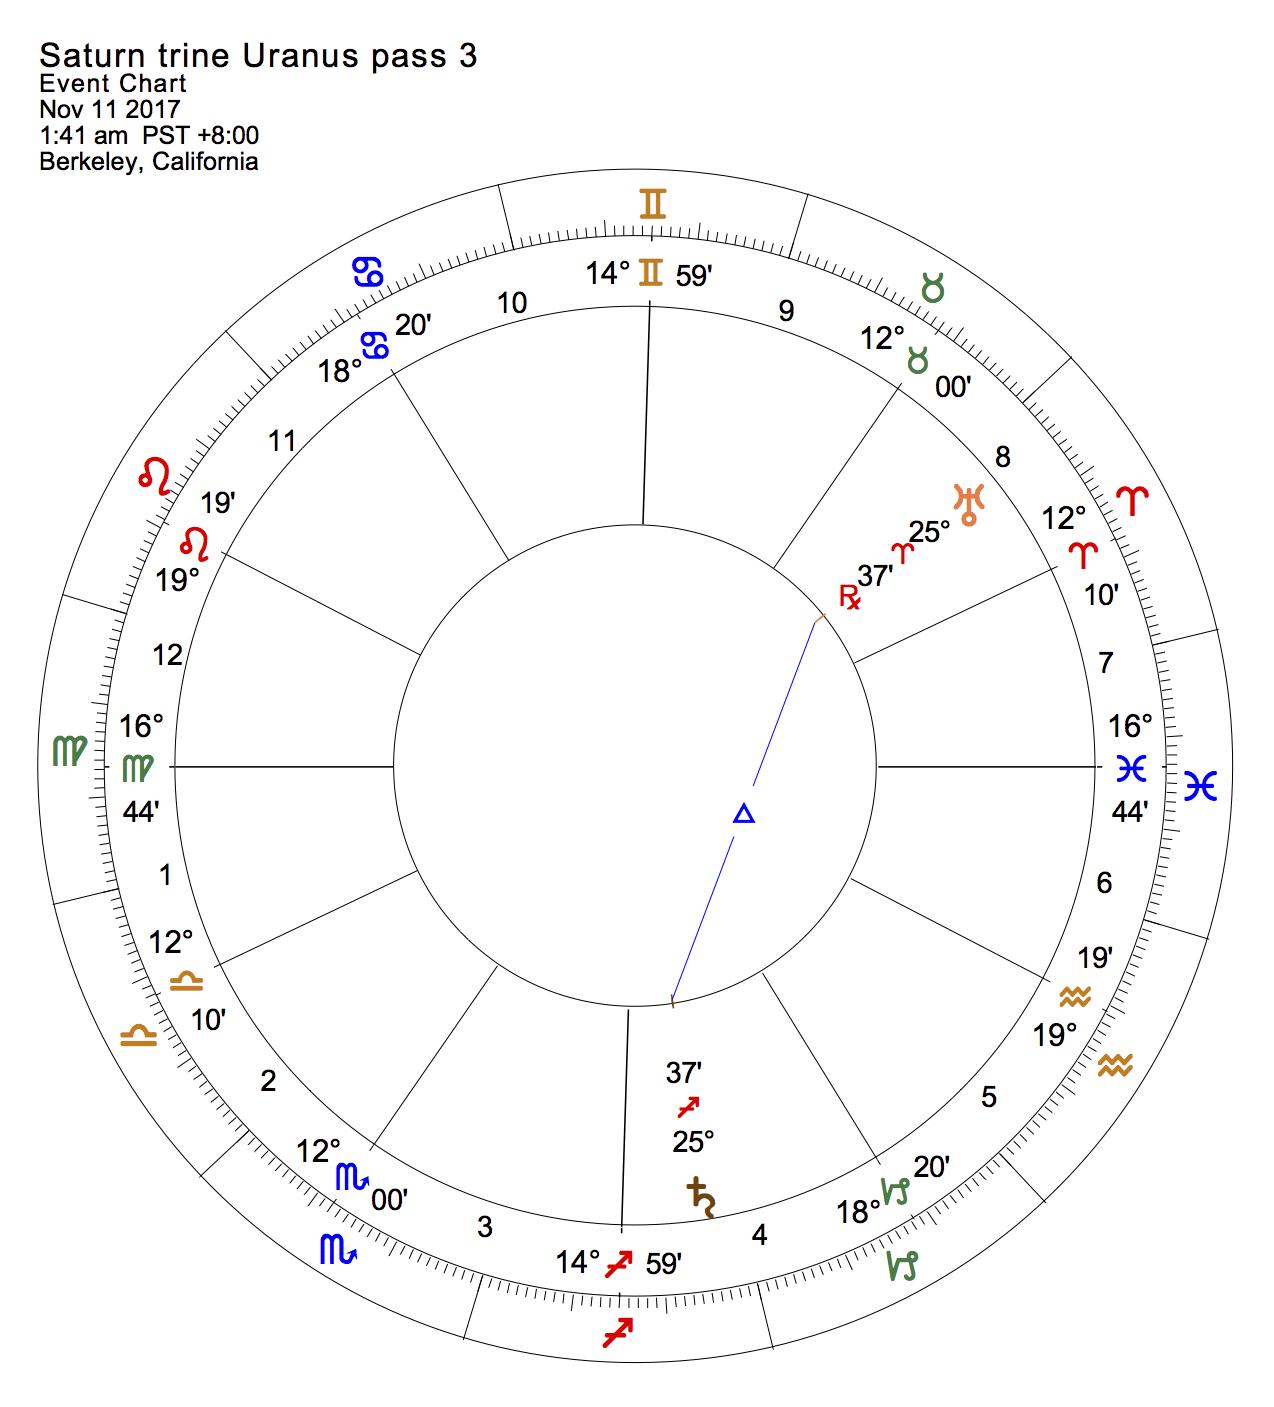 Saturn trine Uranus pass 3